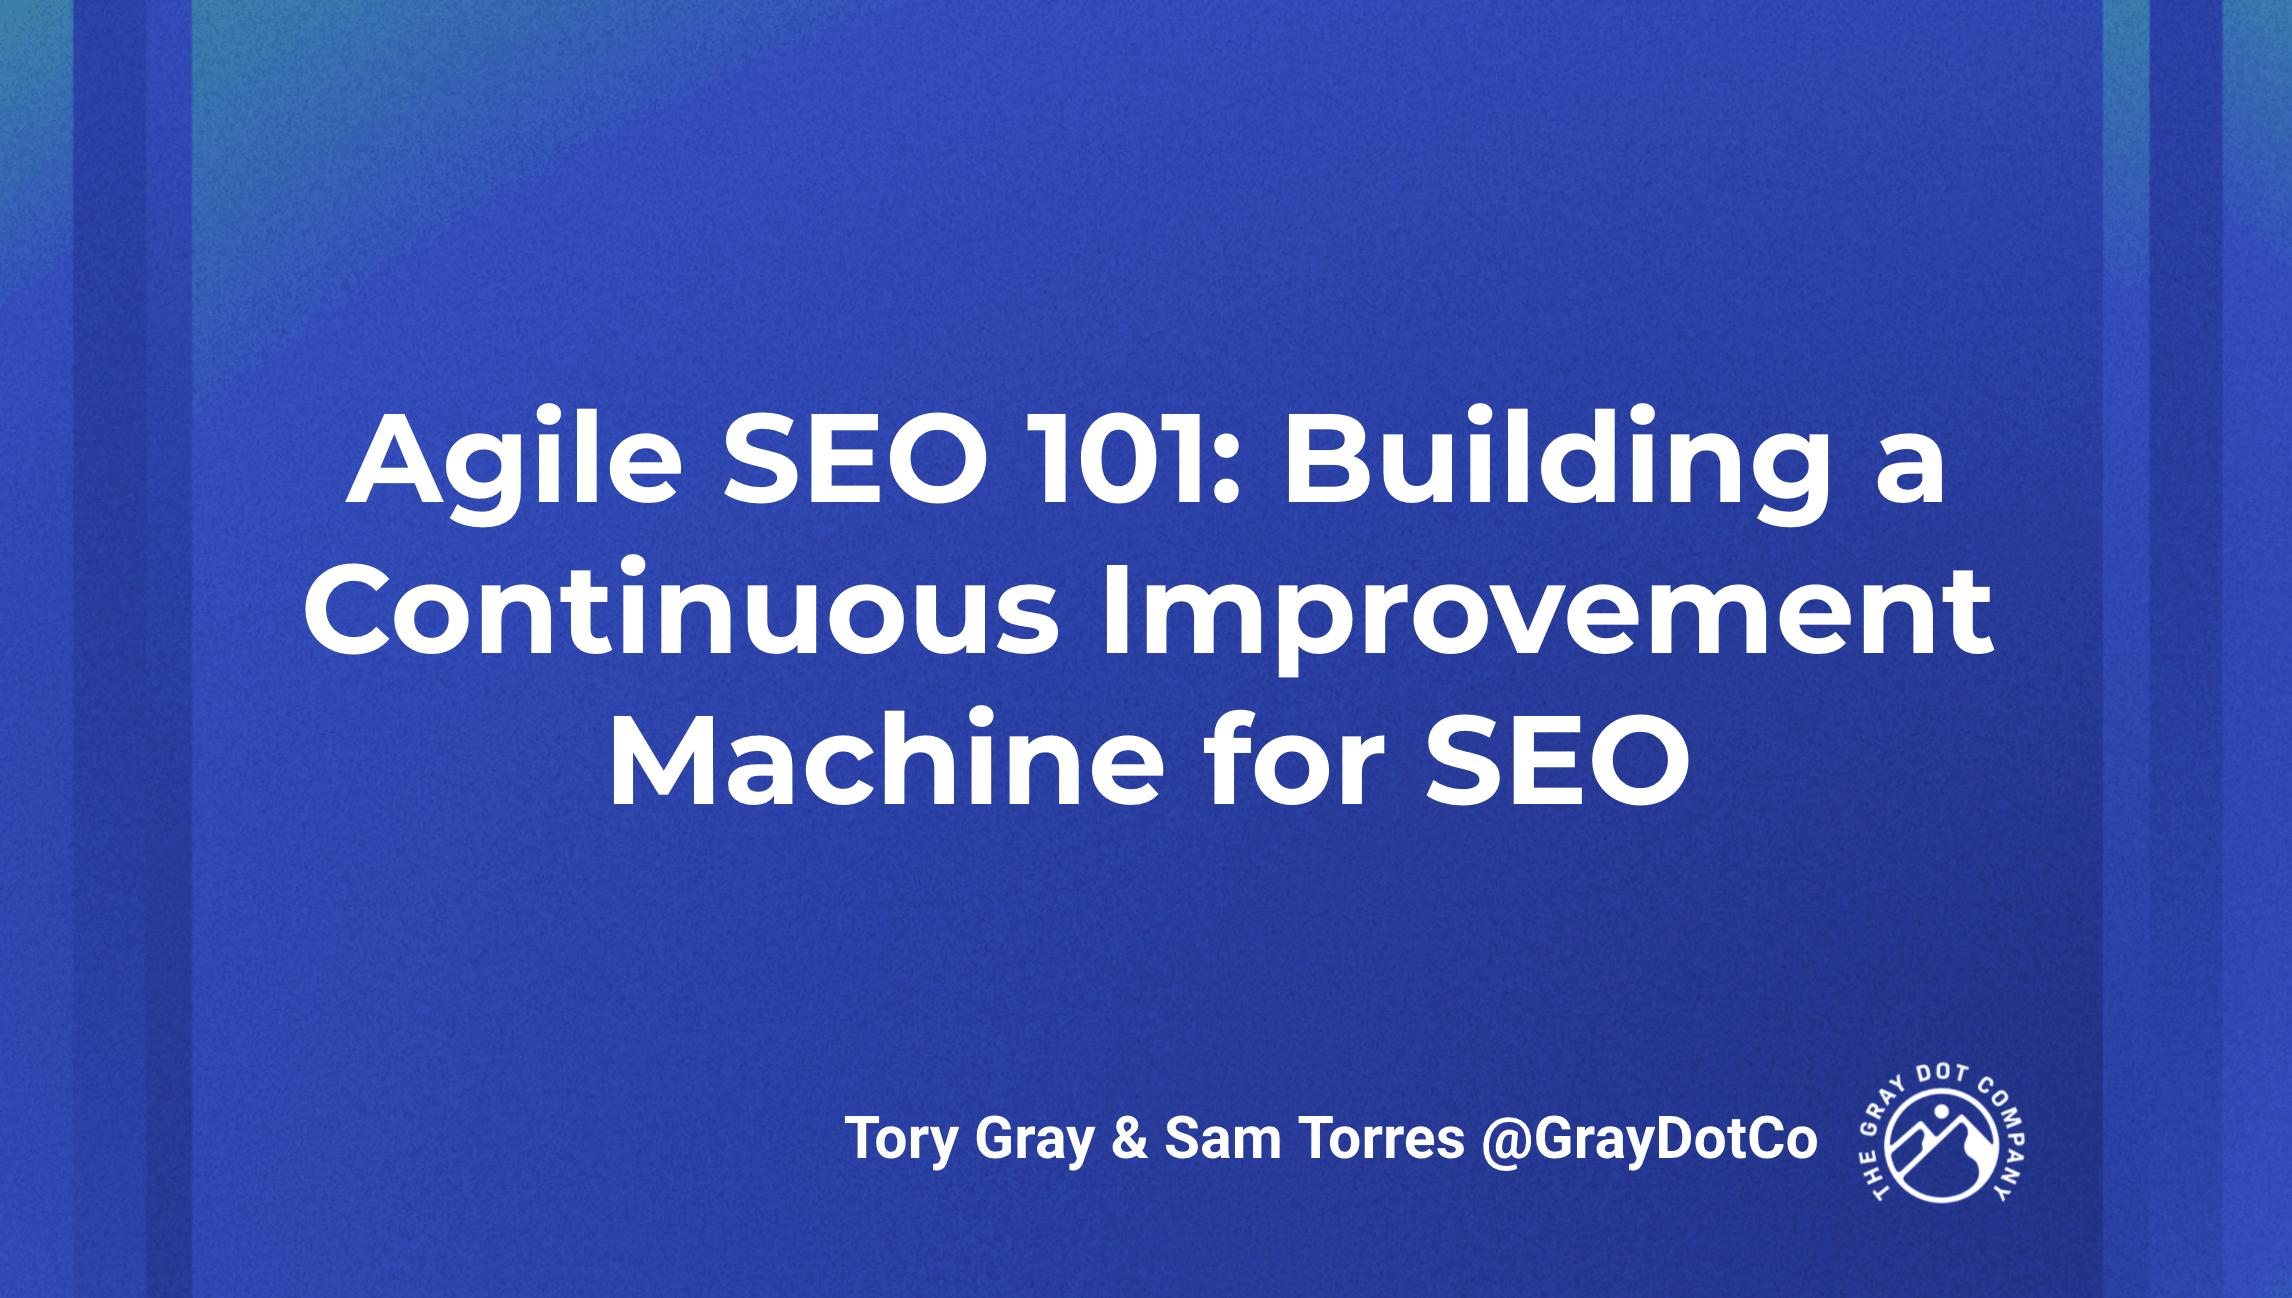 Agile SEO 101: Building a Continuous Improvement Machine for SEO